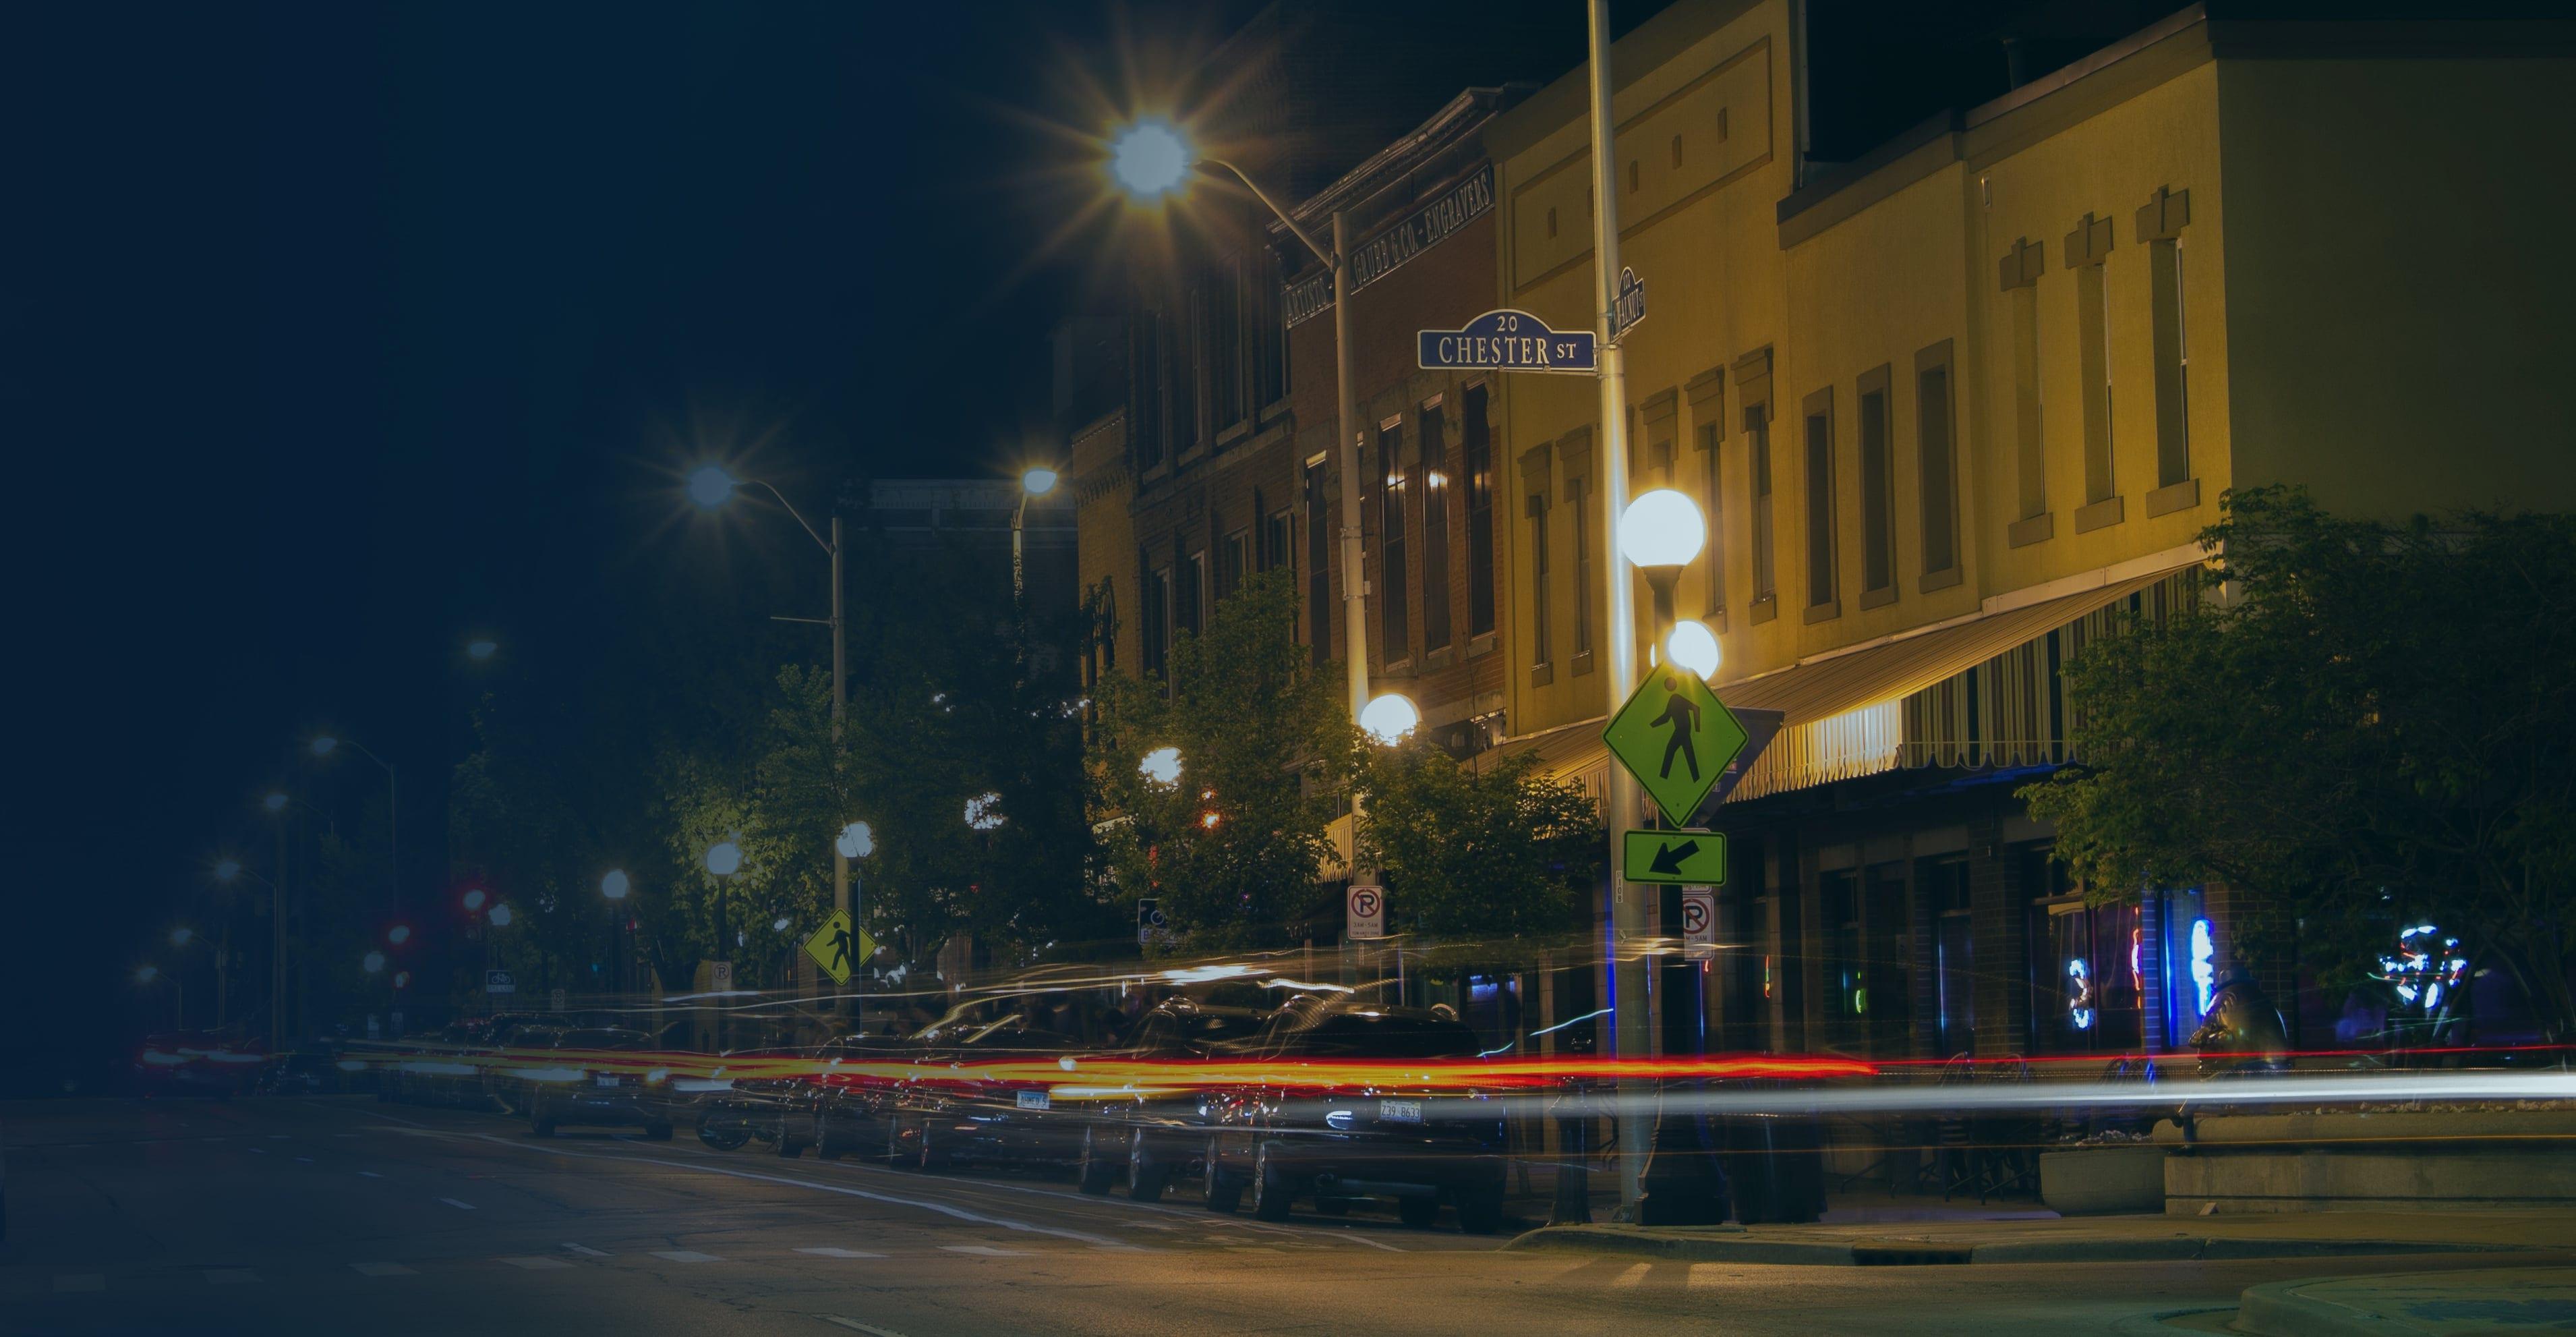 Downtown Champaign, Illinois